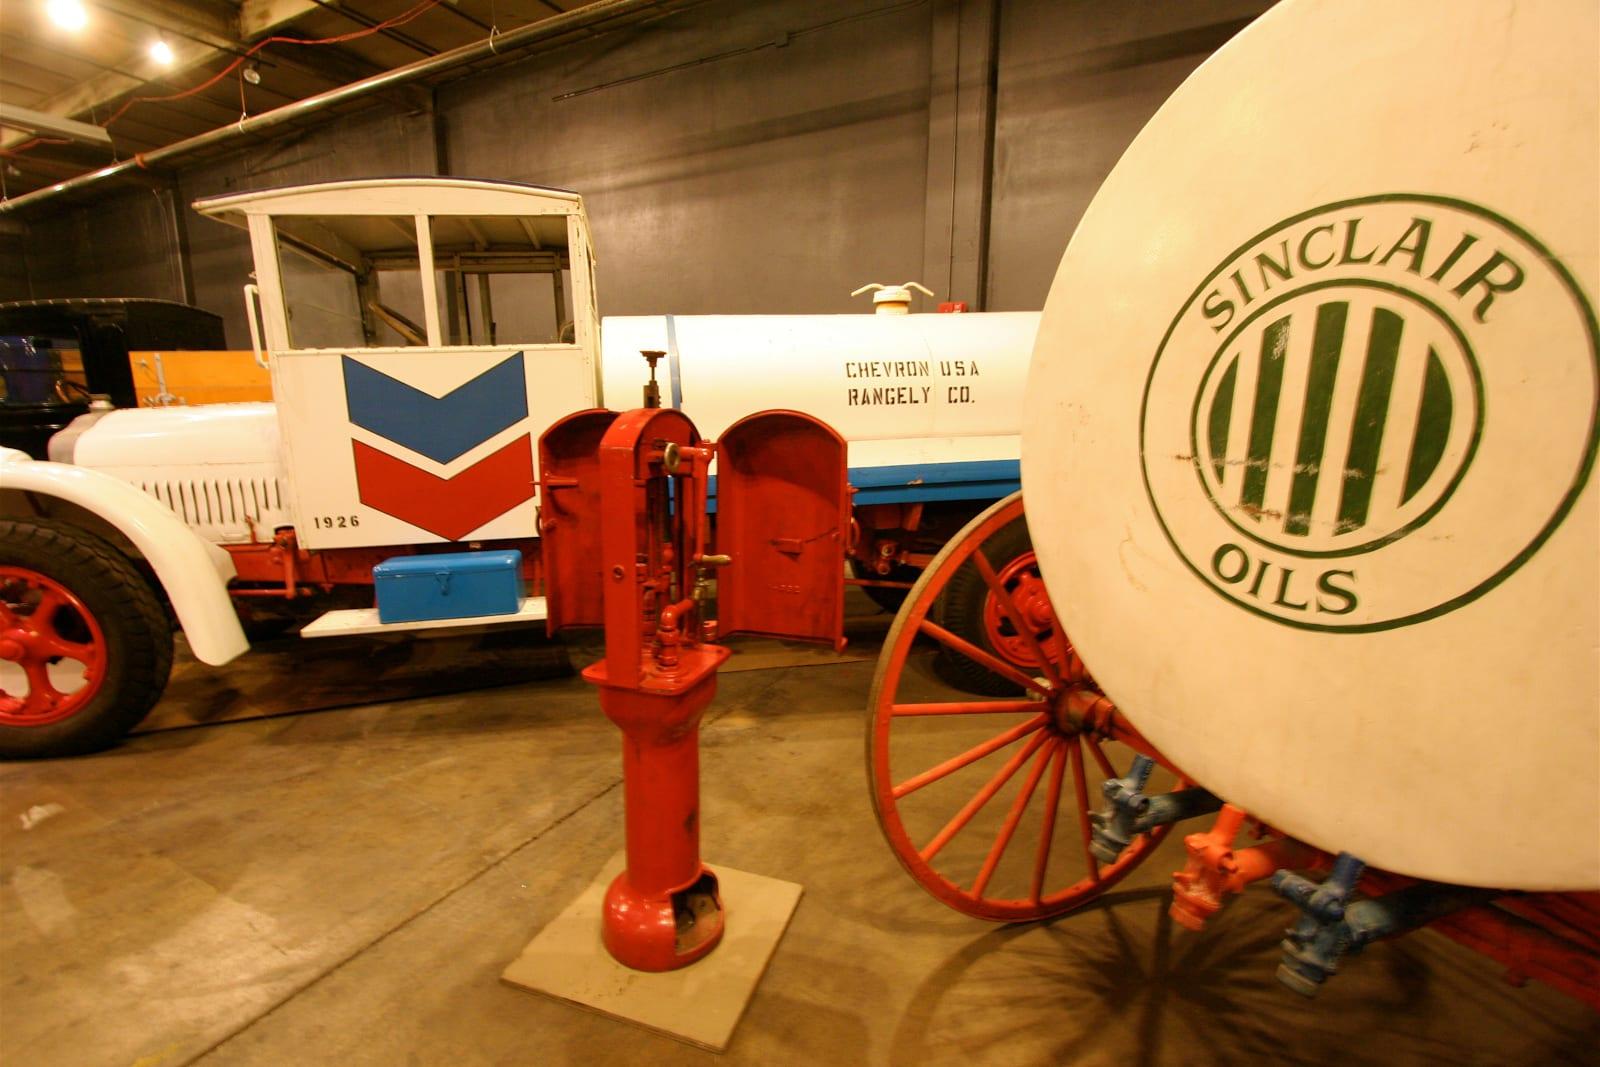 Forney Museum of Transportation Chevron Gasoline Truck